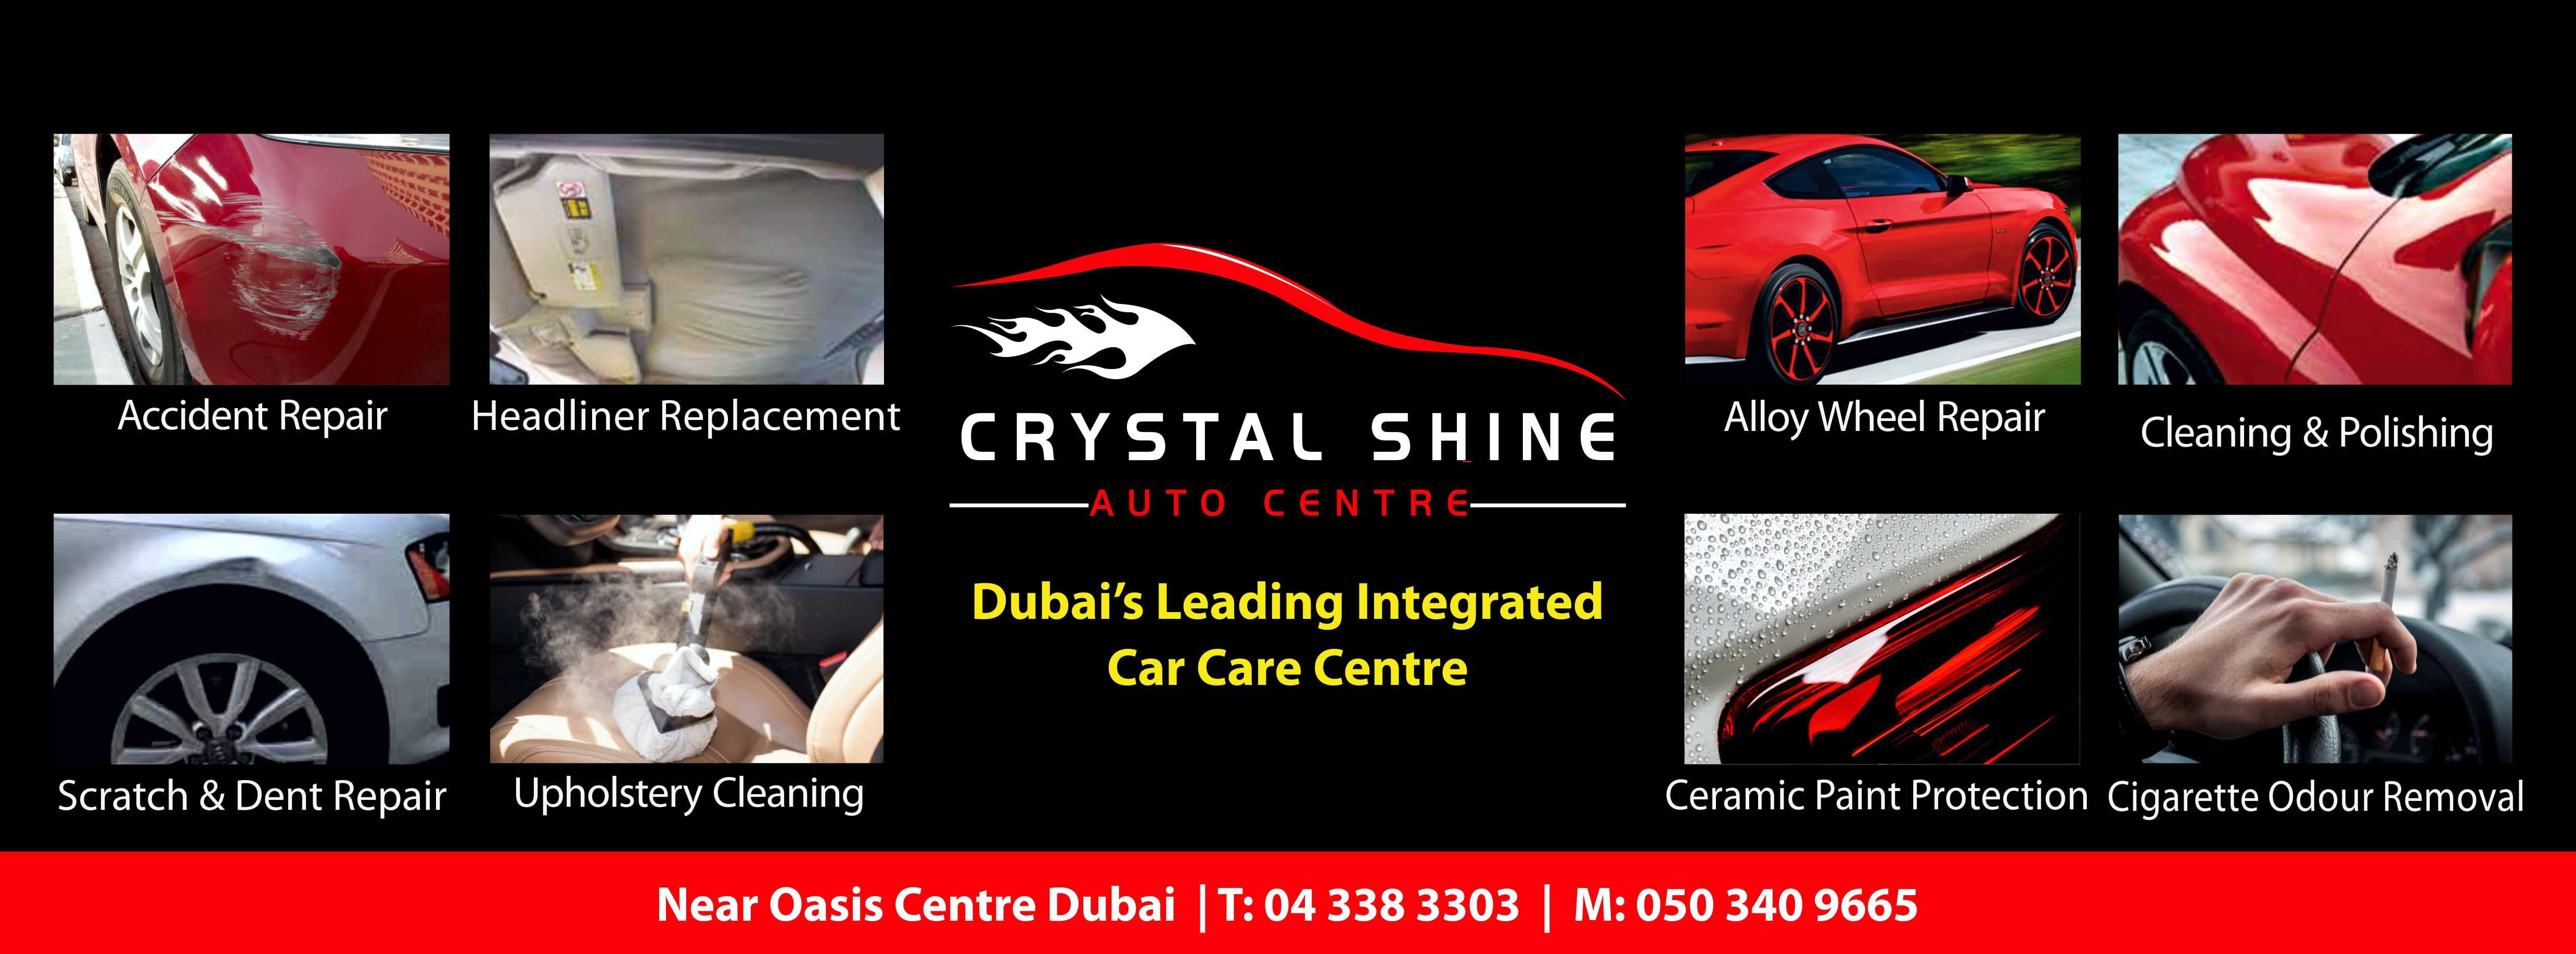 Crystal Shine Auto Centre   LinkedIn